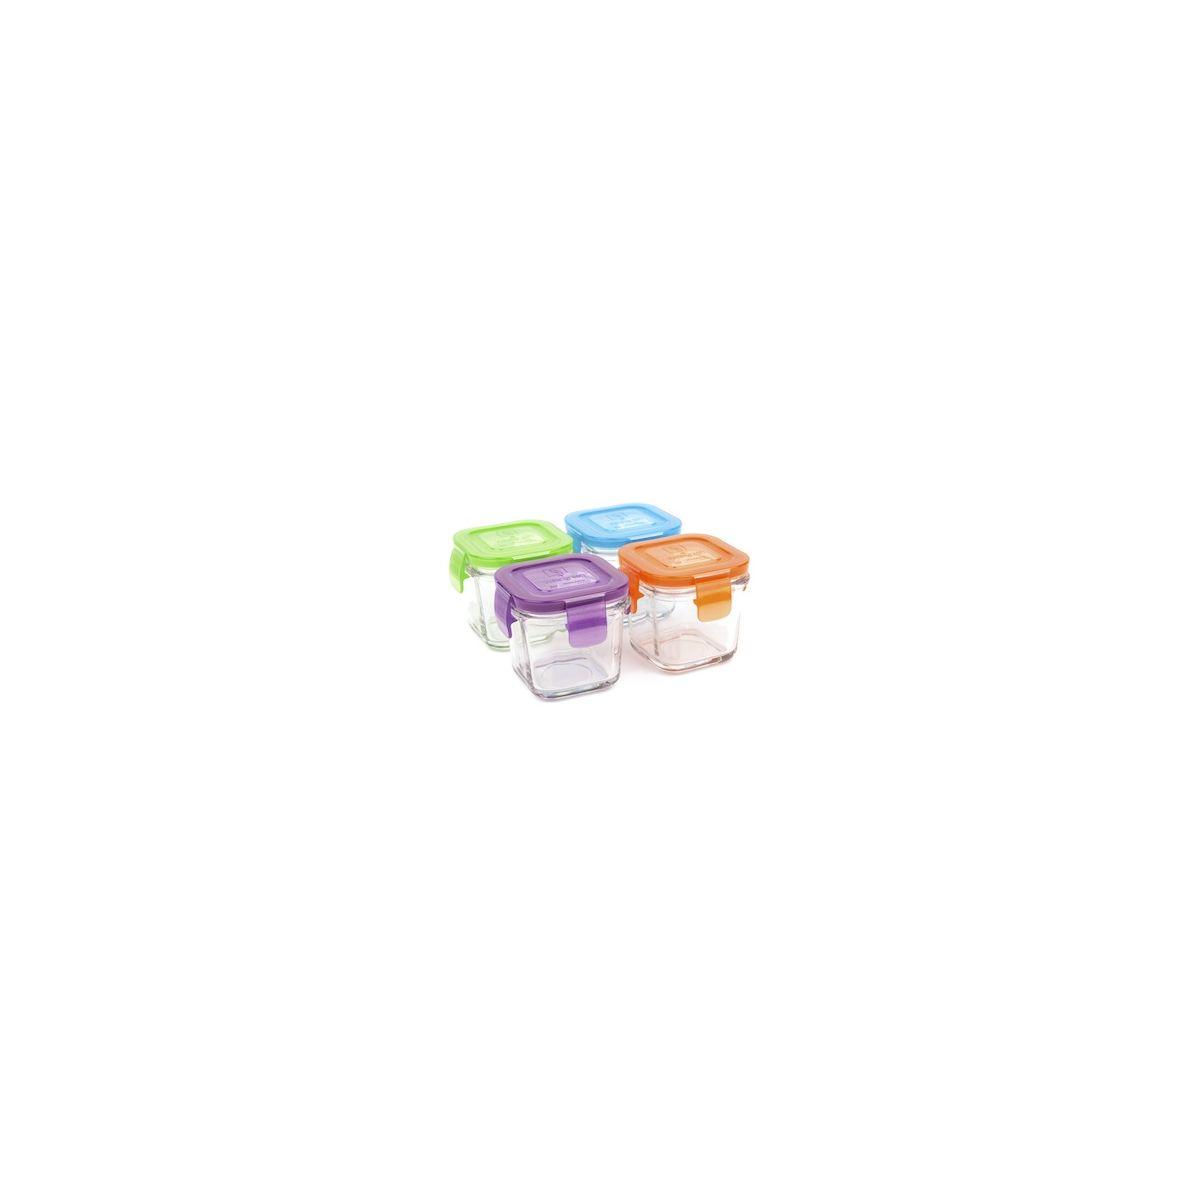 set de petits pots carr s en verre tremp avec couvercle 4 x 120 ml sebio. Black Bedroom Furniture Sets. Home Design Ideas